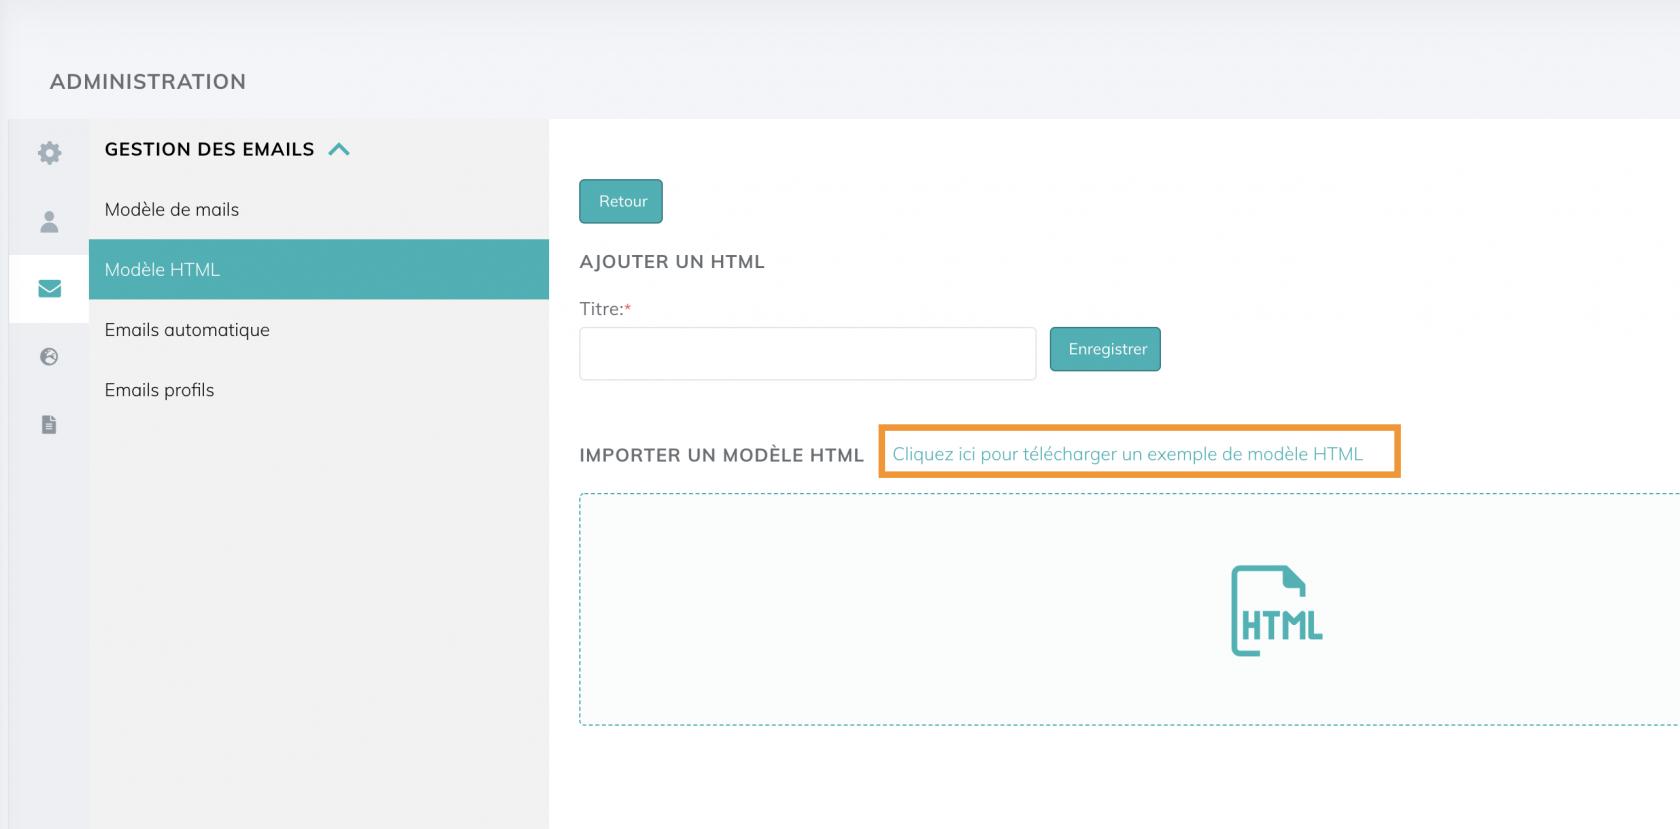 Modele-Import-HTML.png